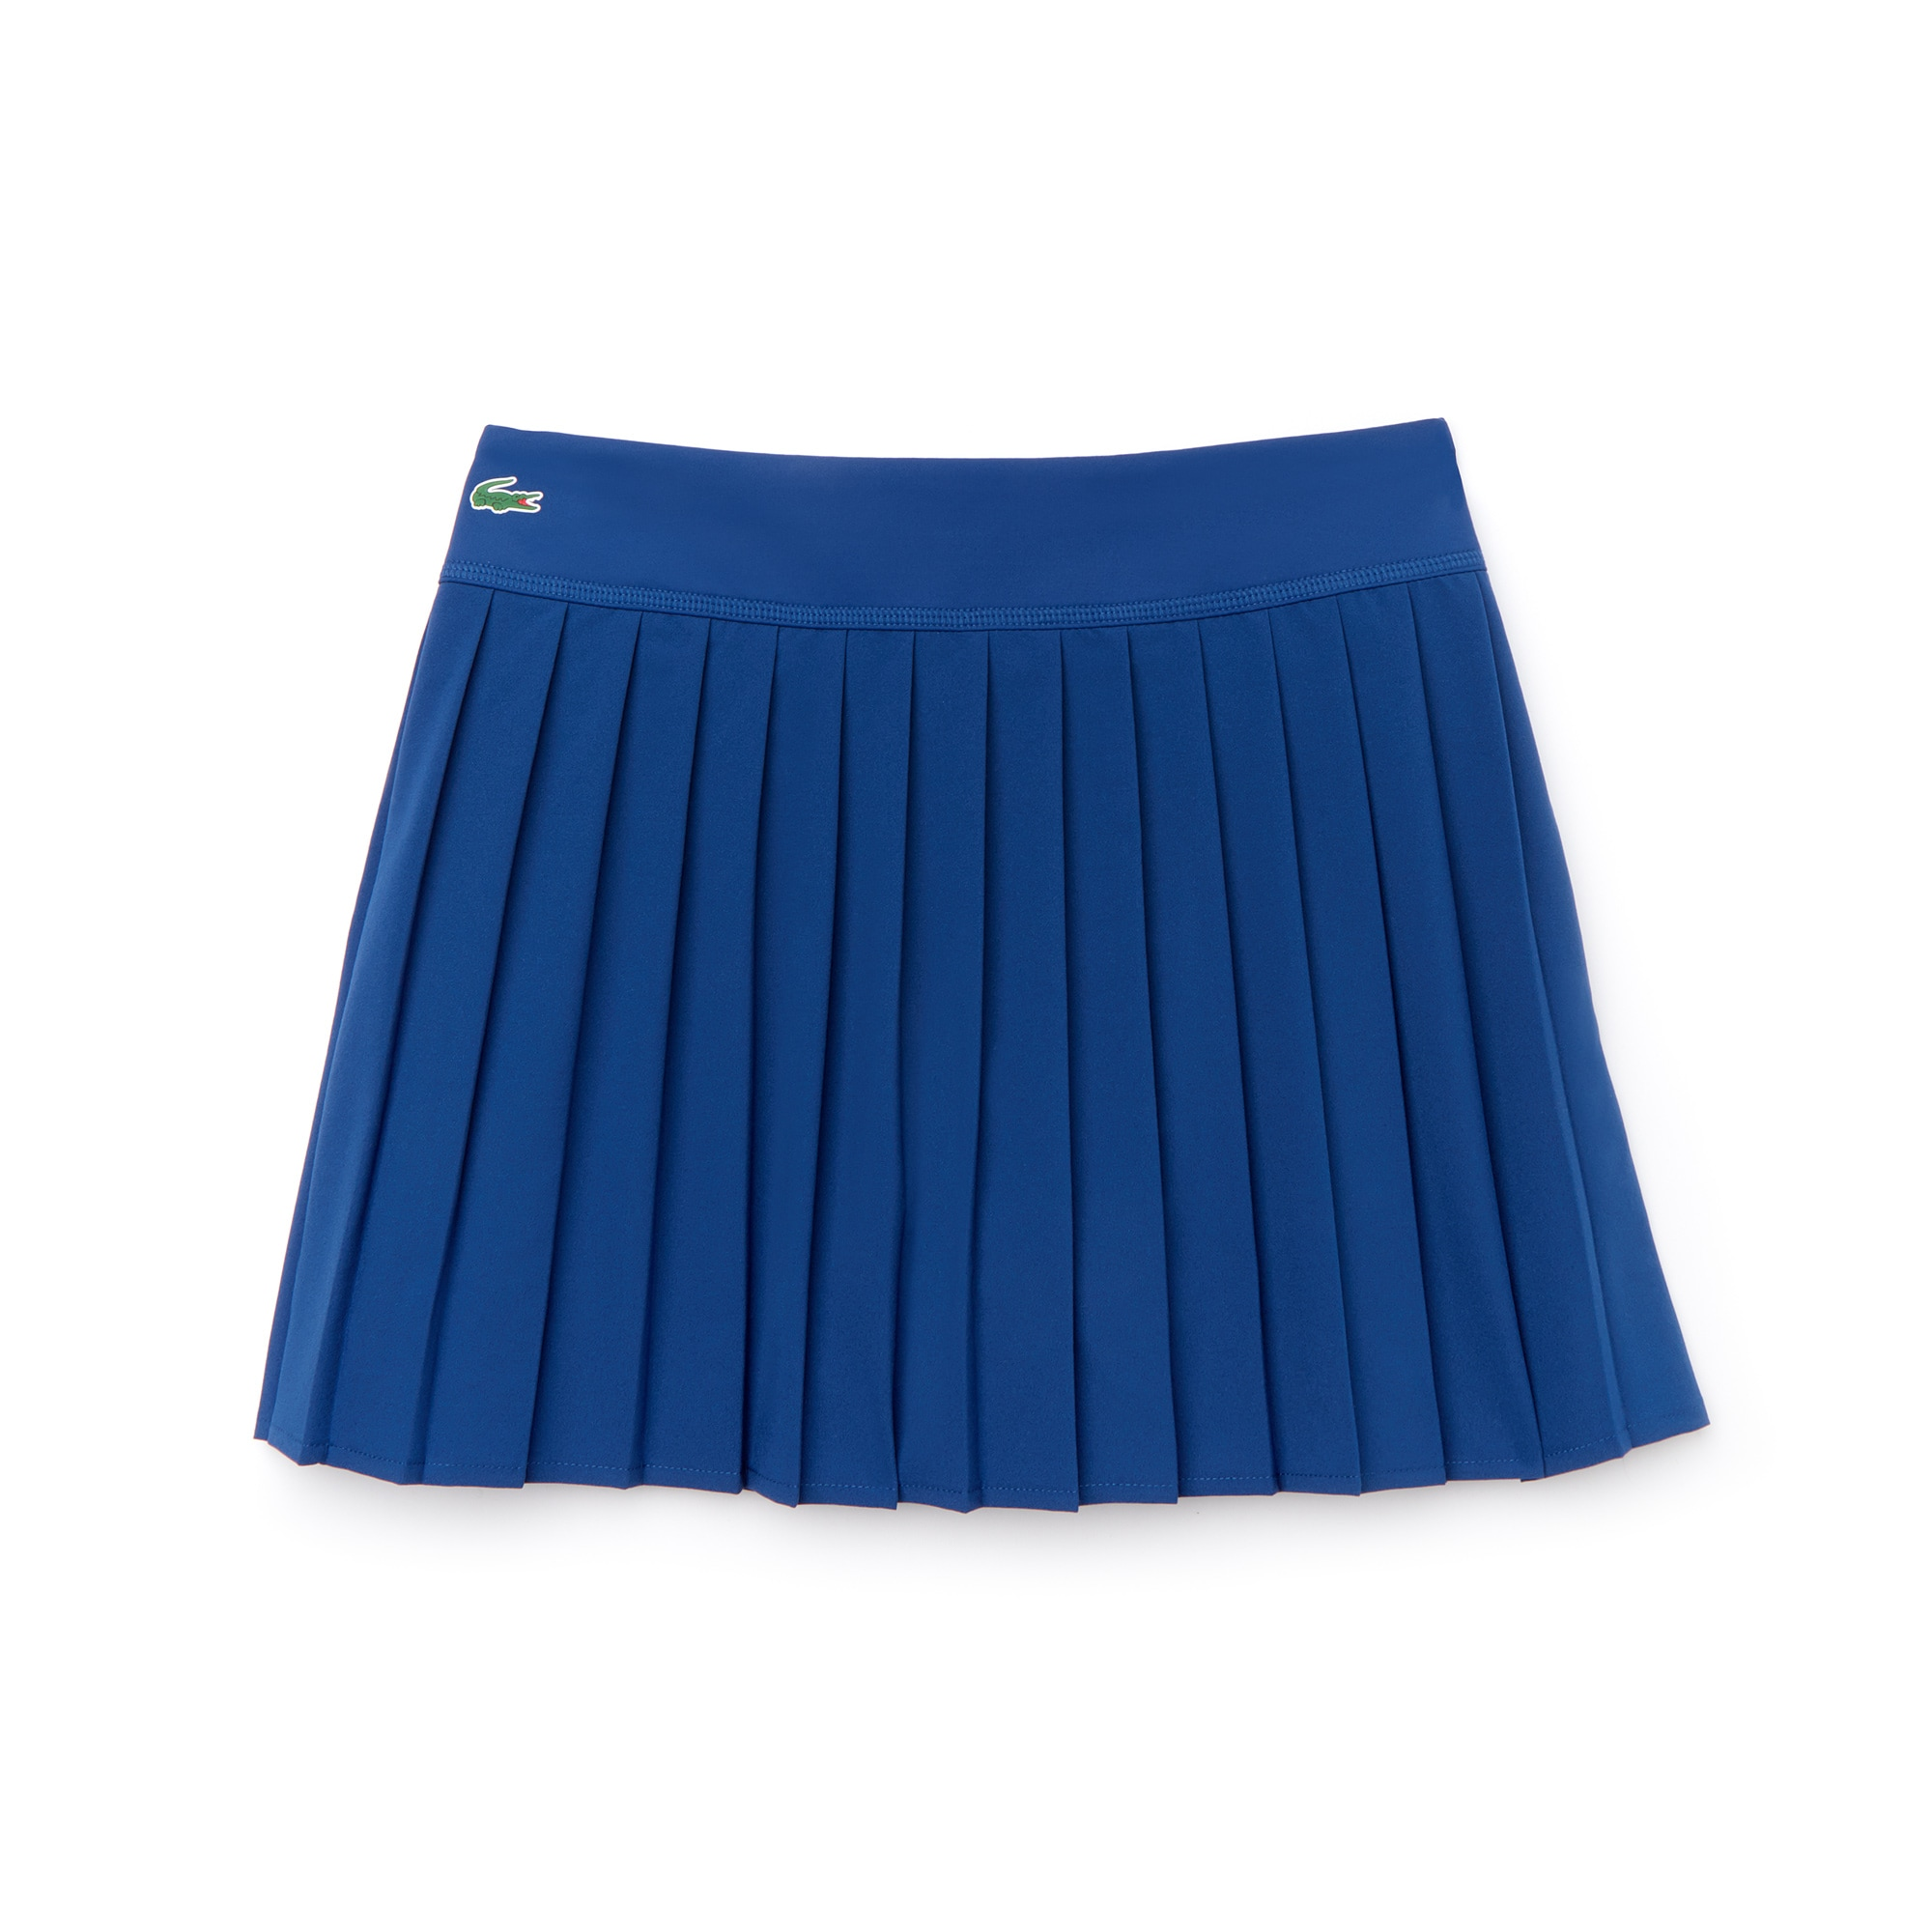 Womens 라코스테 Lacoste SPORT Tennis Technical Mesh Pleated Skirt,navy blue / navy blue / navy blue